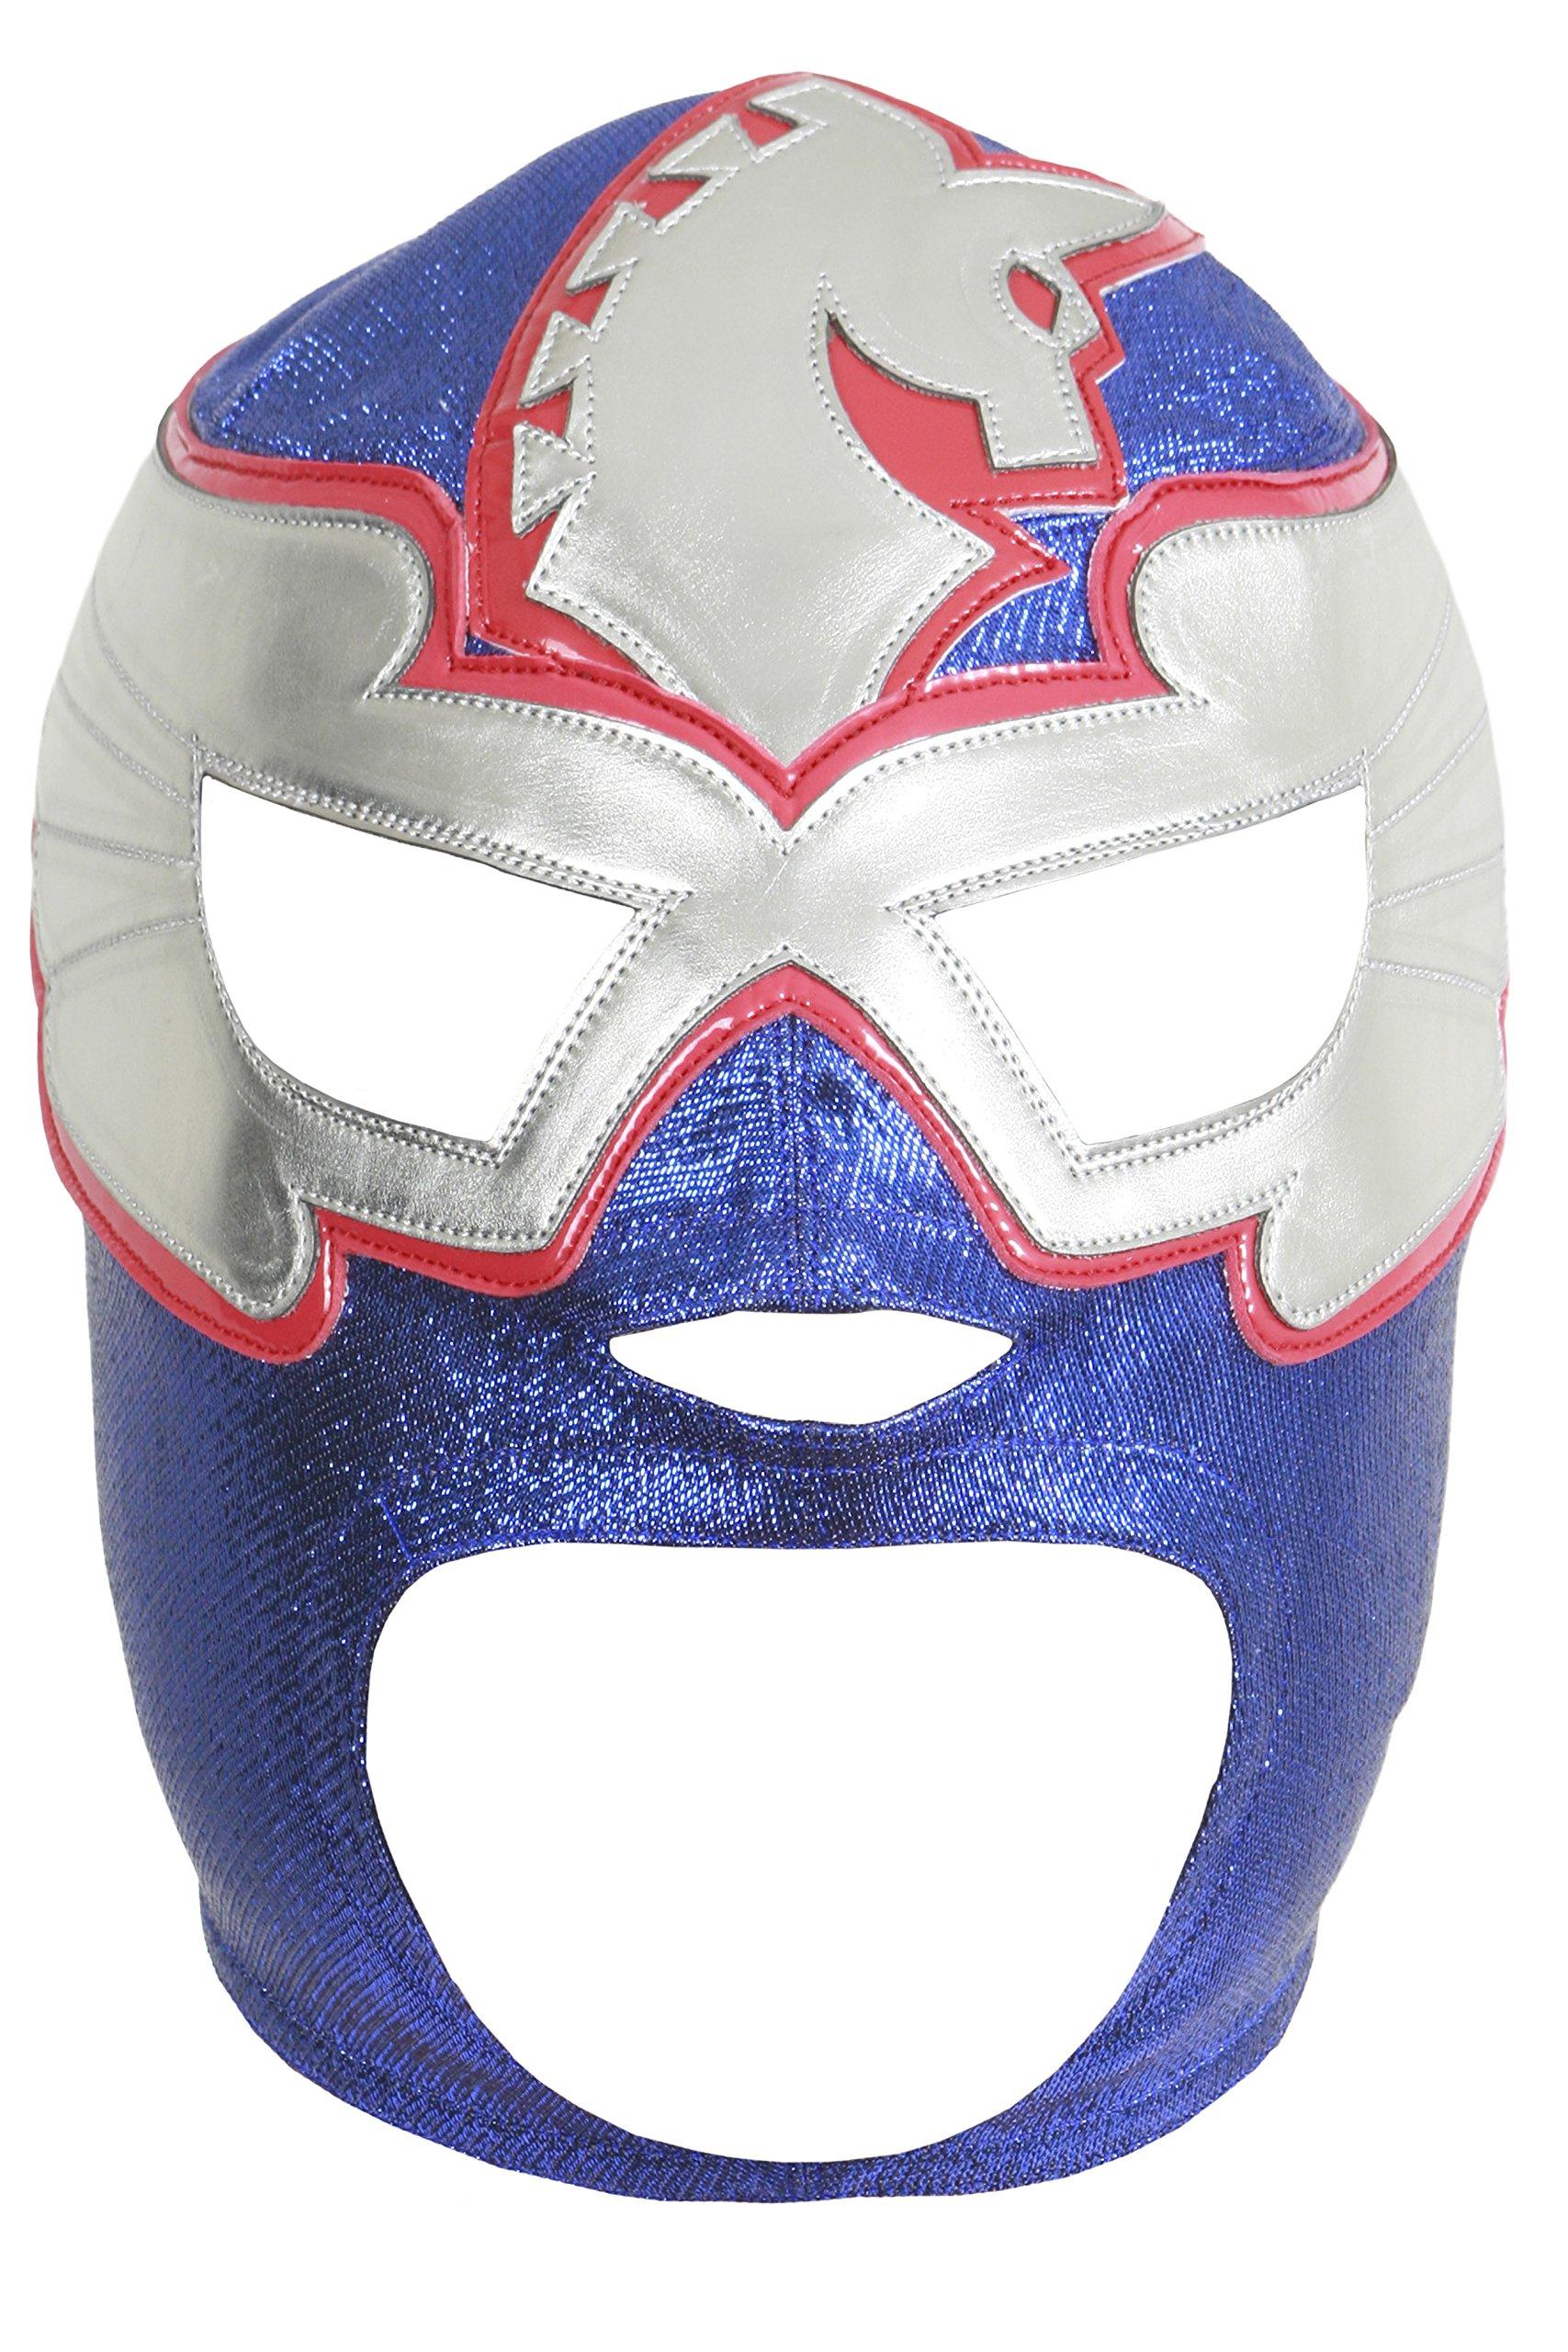 Deportes Martinez Pegasus Kid Professional Lucha Libre Mask Adult Luchador Mask Blue Red